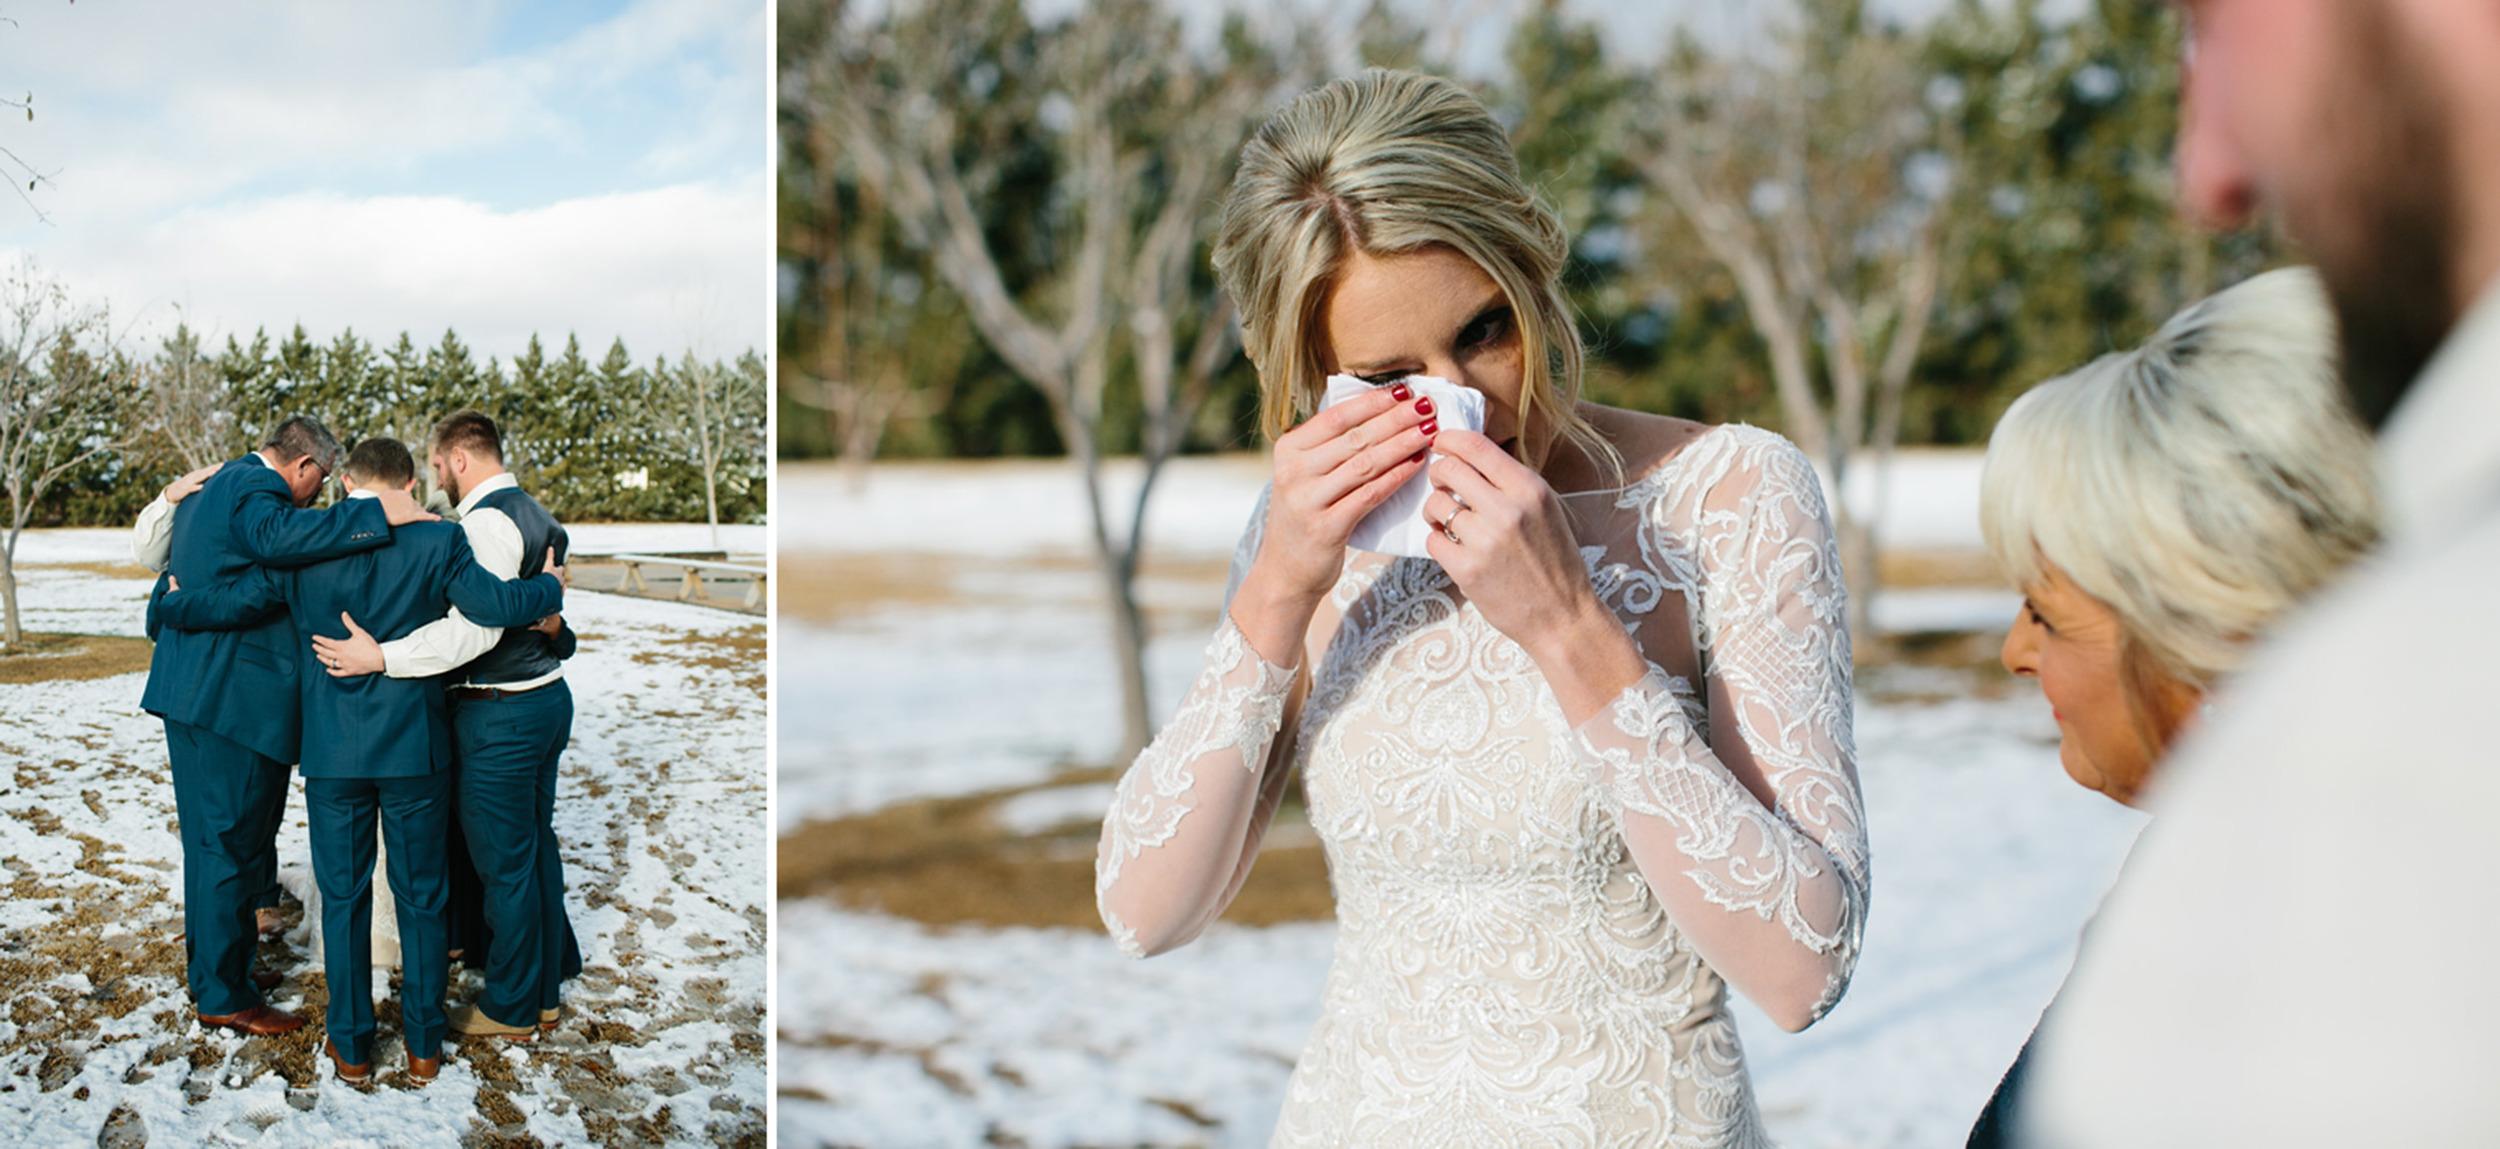 Cotton_Creek_Barn_Winter_Wedding_WeddingPhotographer035.jpg